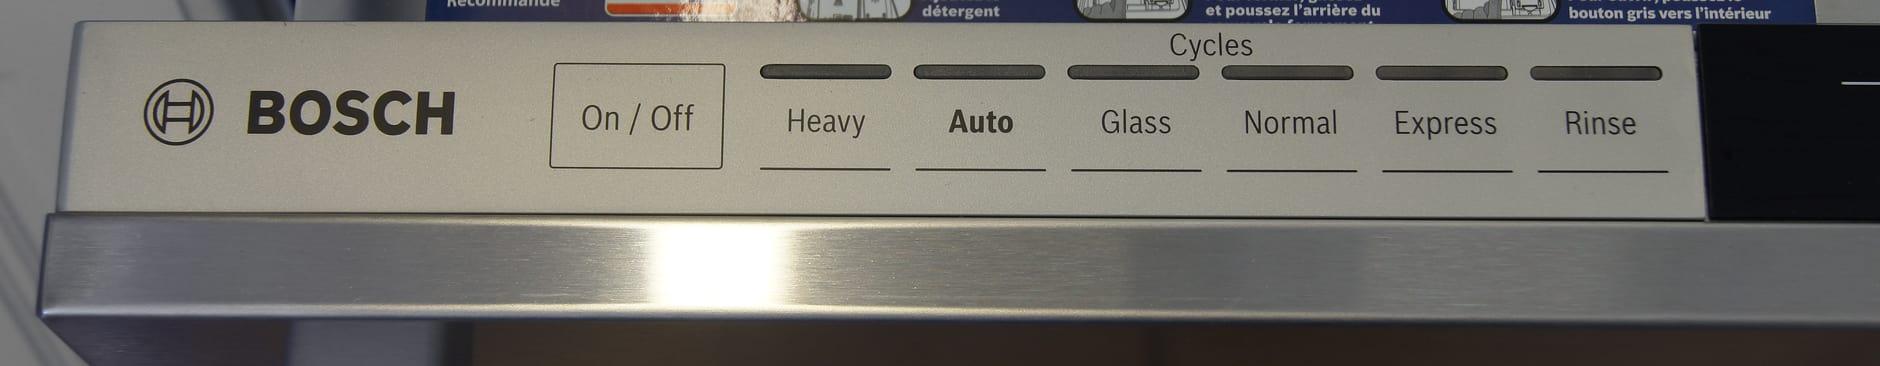 Bosch SHX7PT55UC left control panel